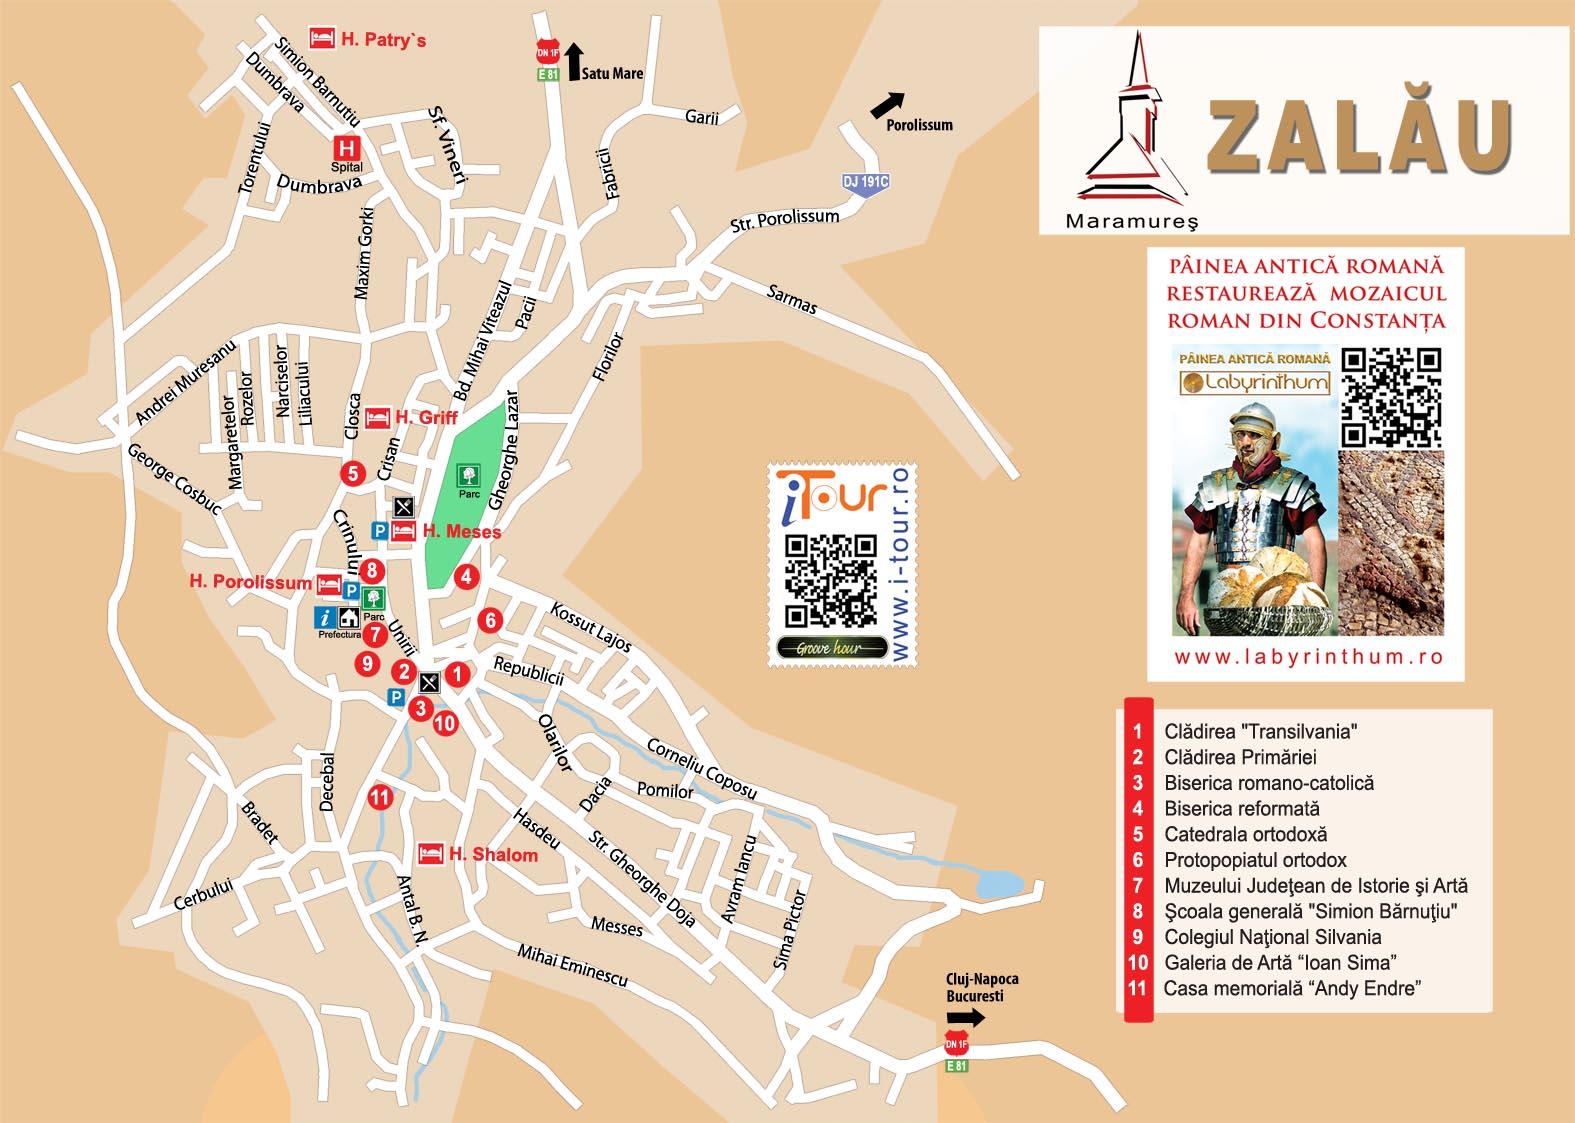 Harta Zalau, atractii turistice